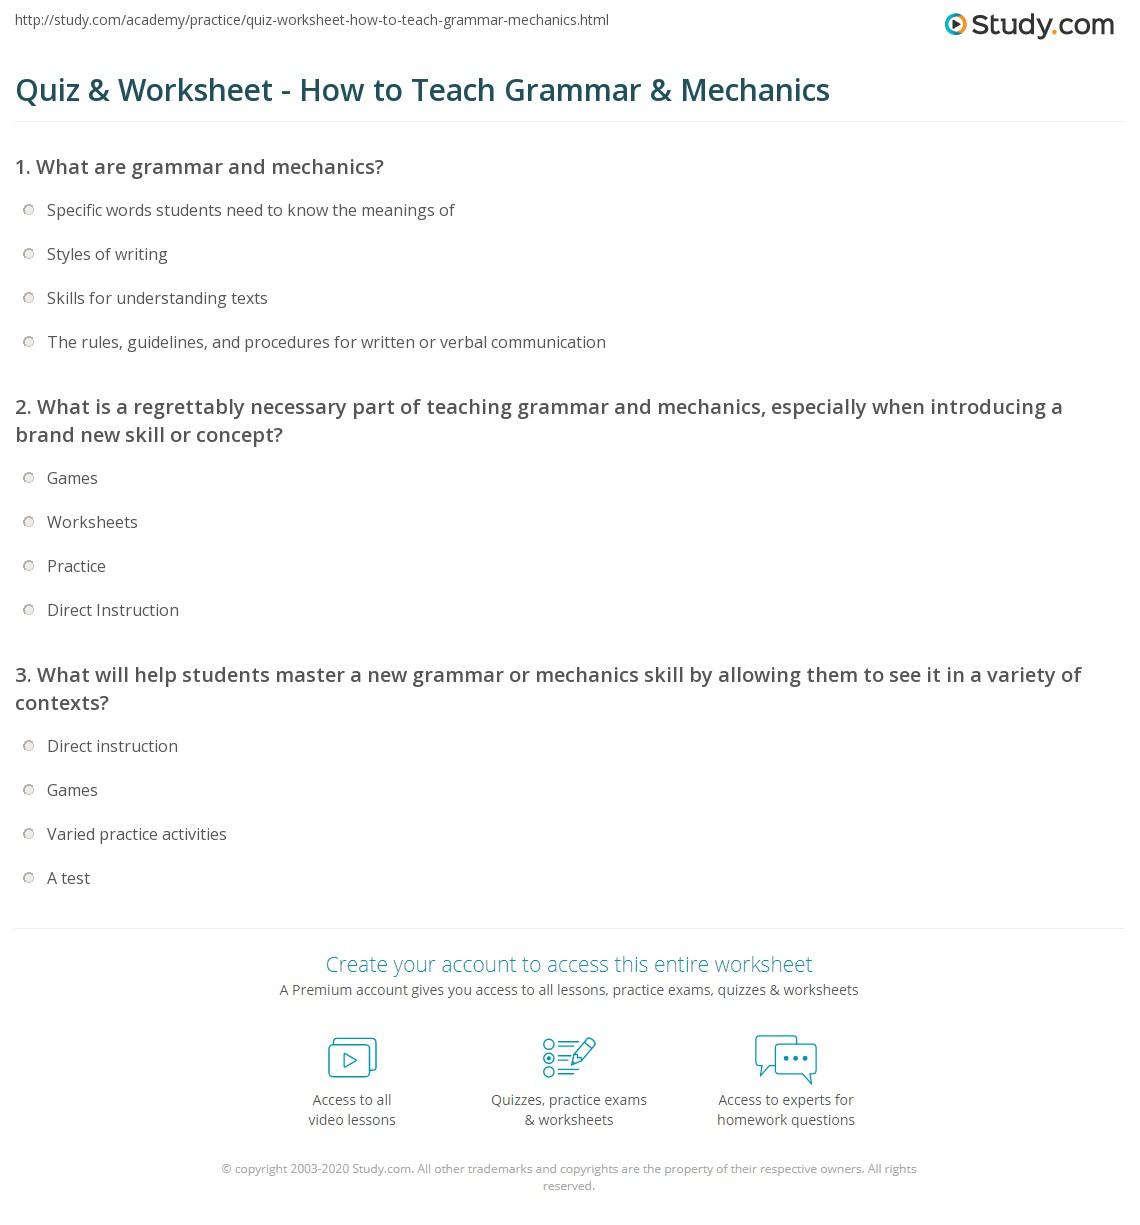 Worksheets Grammar Mechanics Worksheets quiz worksheet how to teach grammar mechanics study com print teaching techniques strategies worksheet